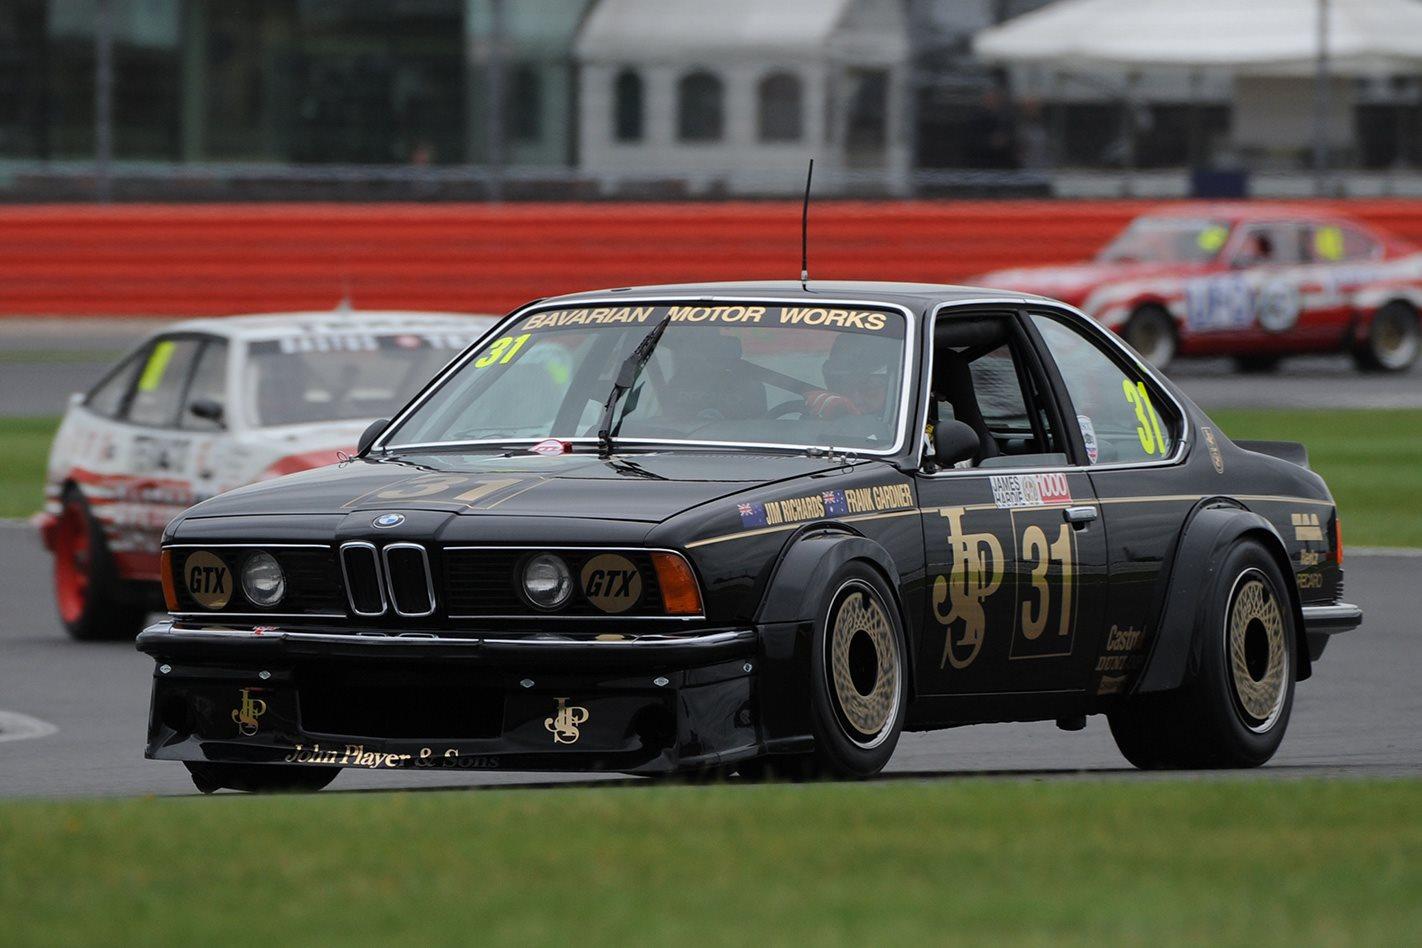 JPS BMW 635 CSi racing